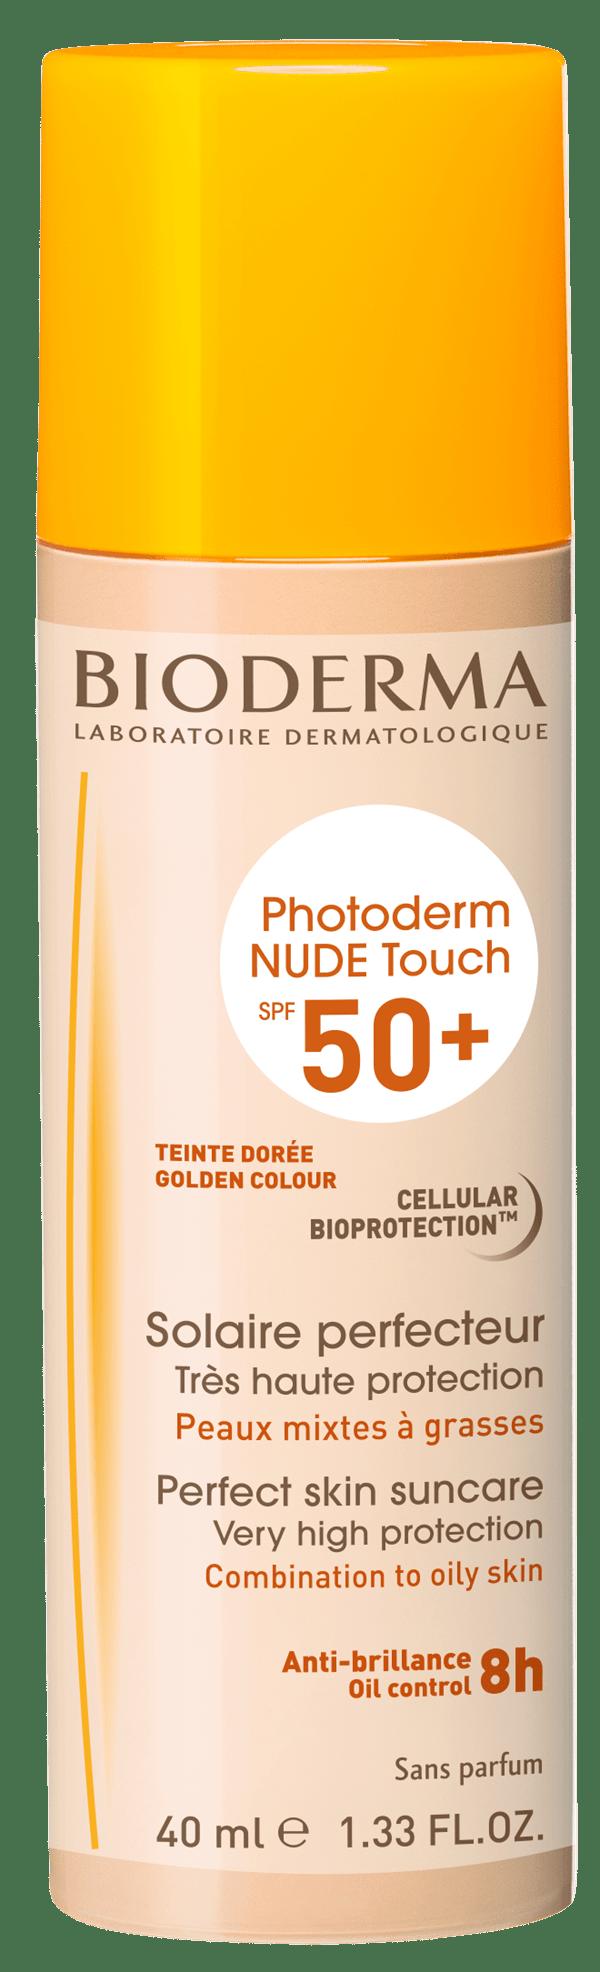 Photoderm Nude Touch Dorado X 40 Ml